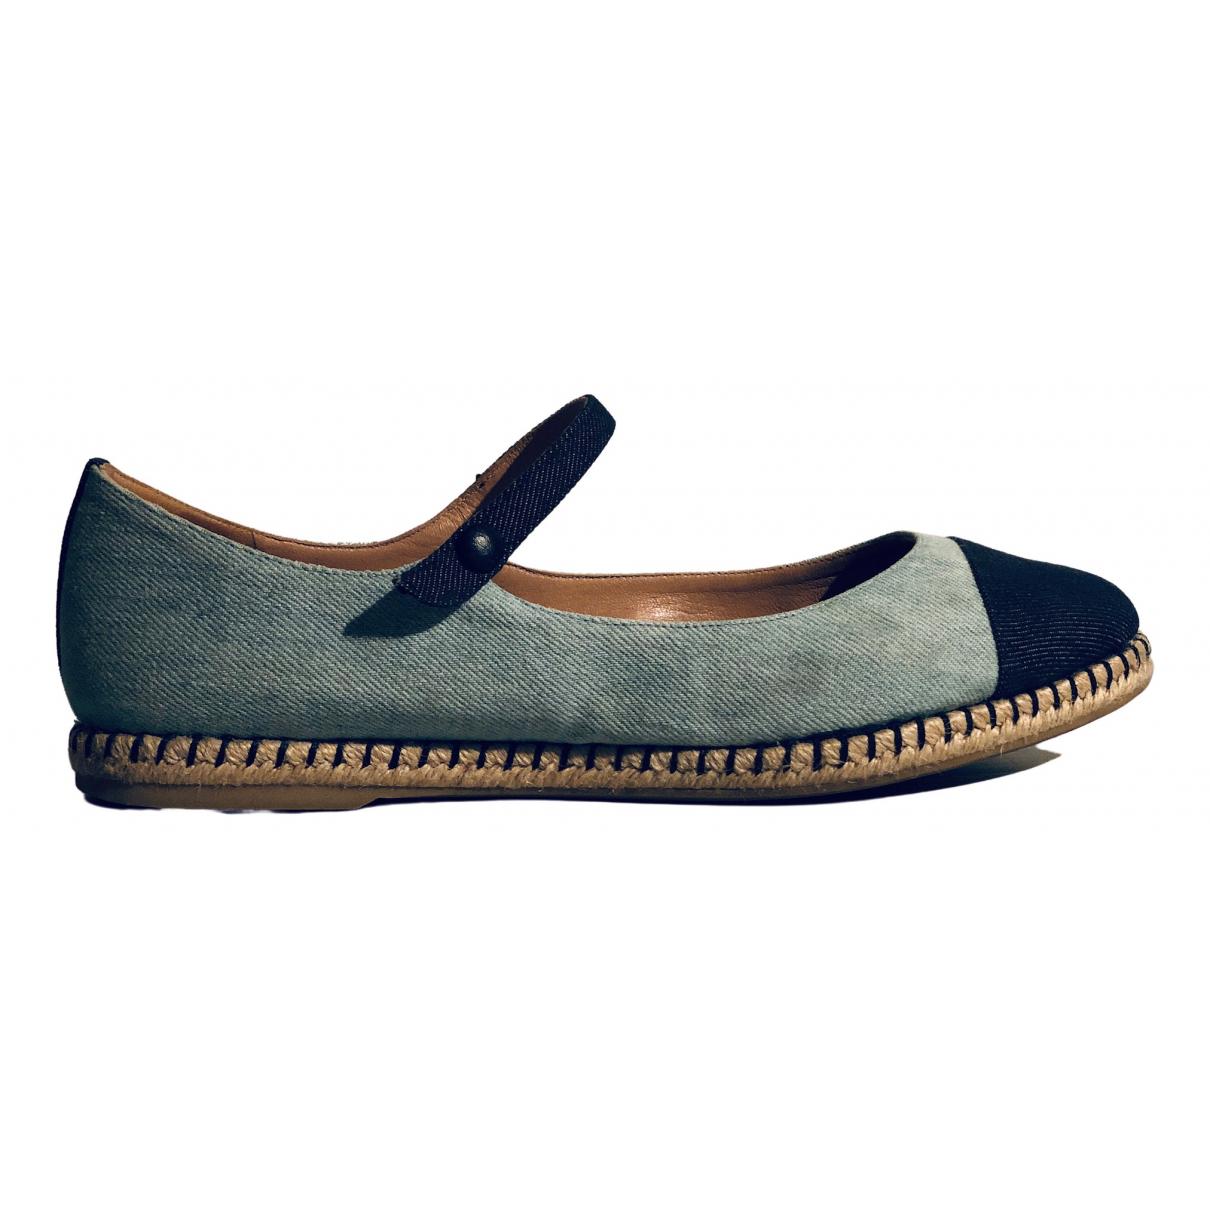 Tabitha Simmons \N Espadrilles in  Blau Denim - Jeans